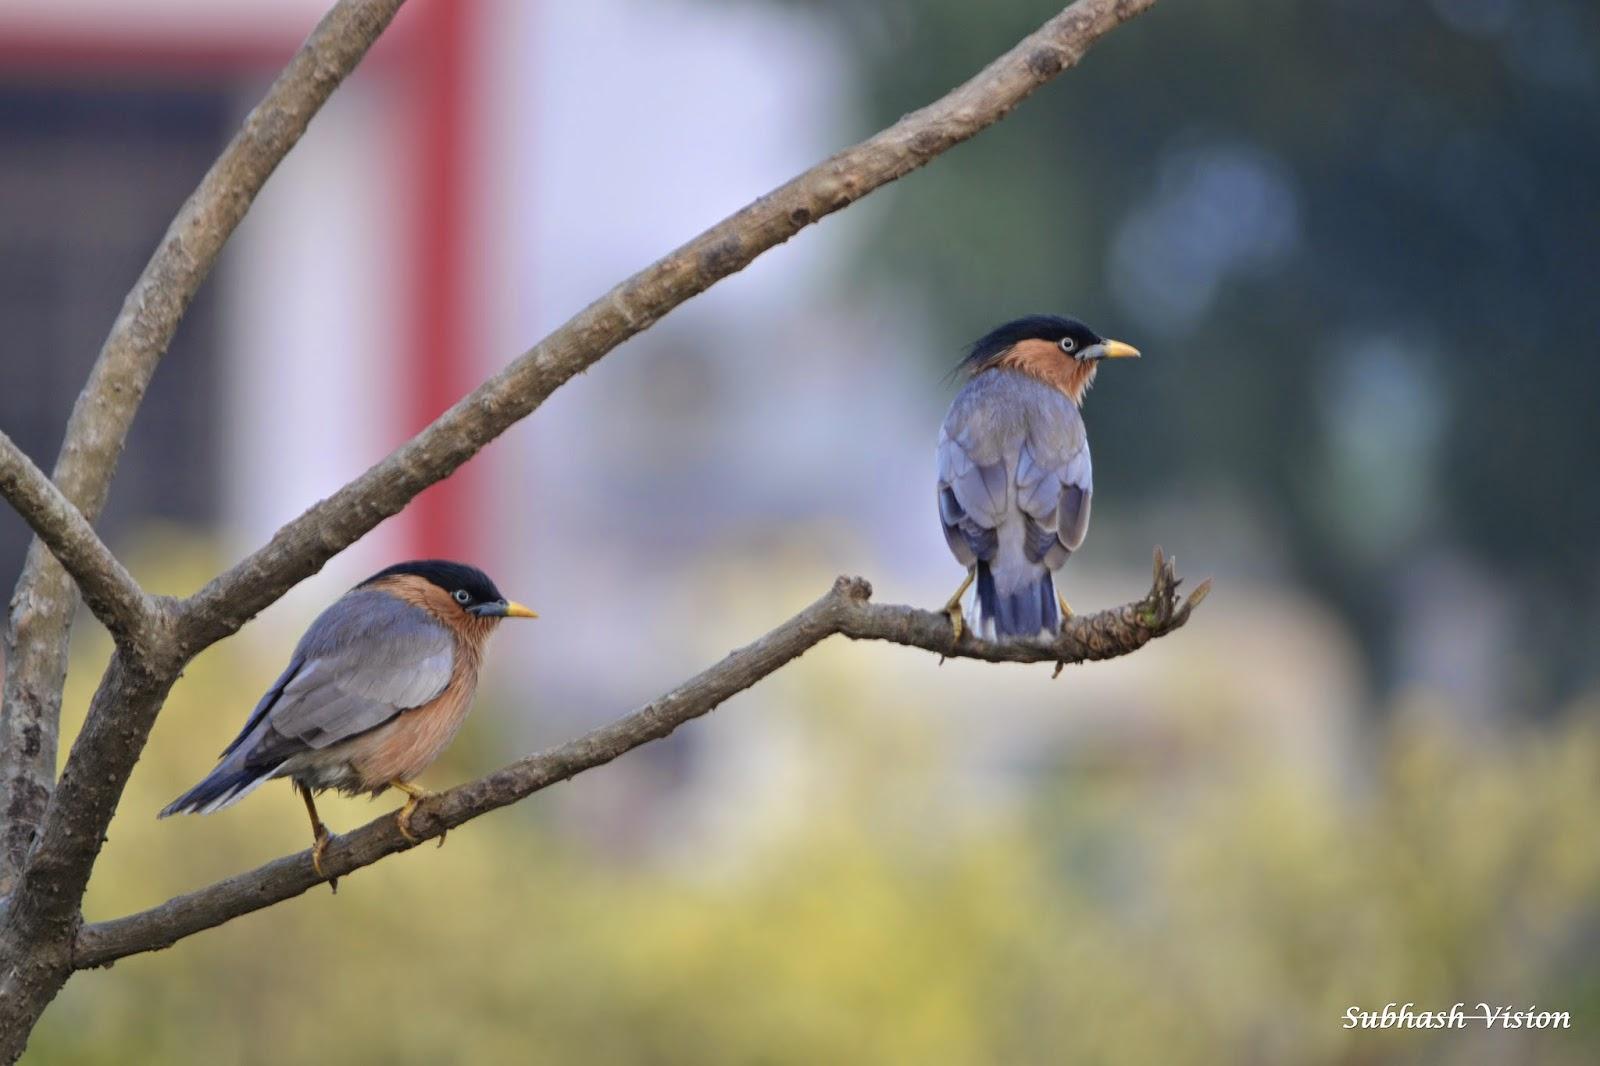 Must-Visit Attraction of Darbhanga-Kusheshwar Asthan Bird Sanctuary